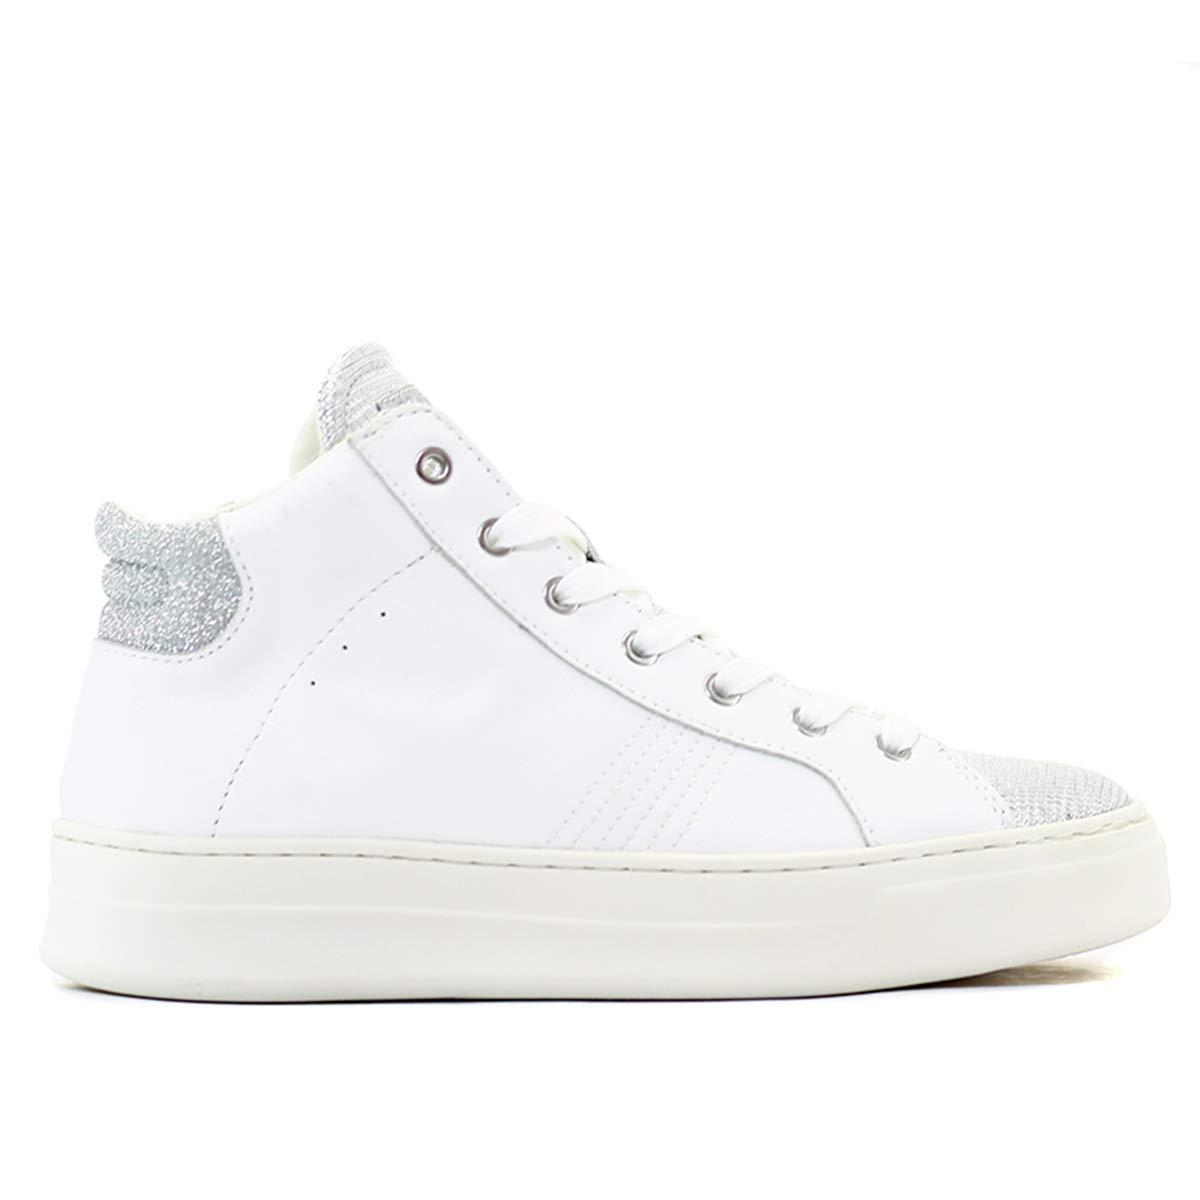 Sneakers alta pelle biancoargento. Crime London